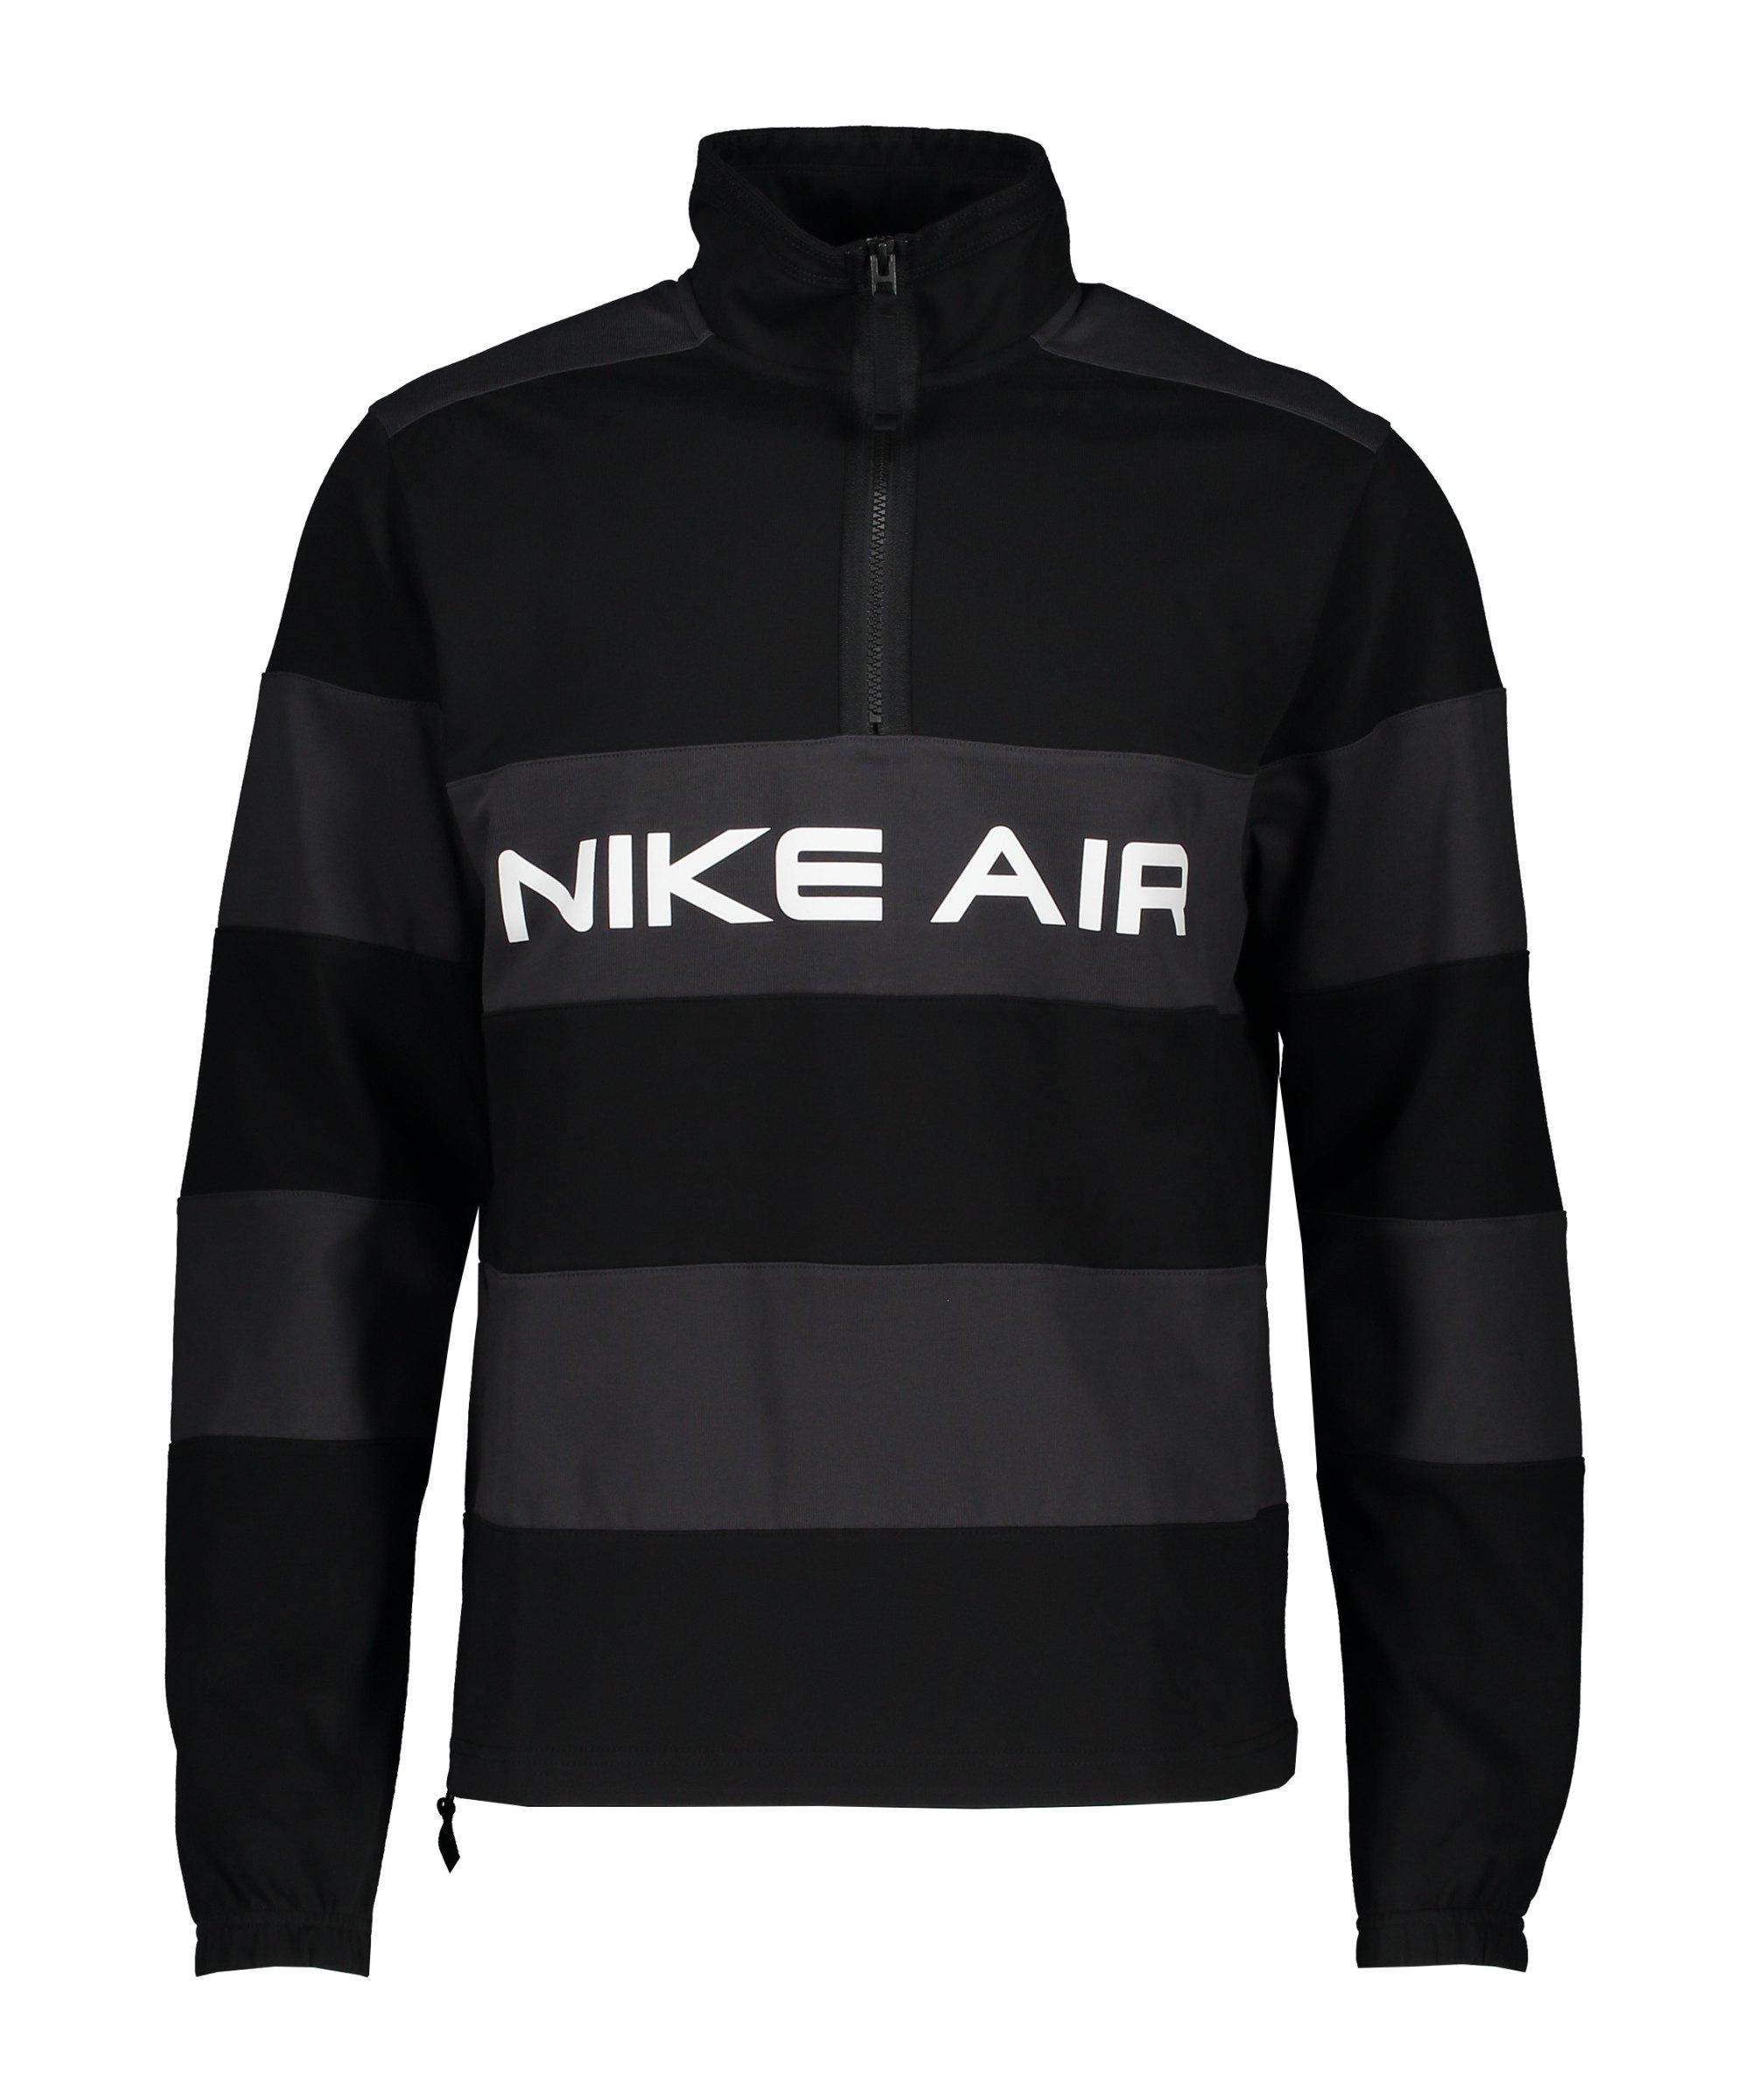 Nike Air Midlayer Sweatshirt Schwarz Grau F010 - schwarz